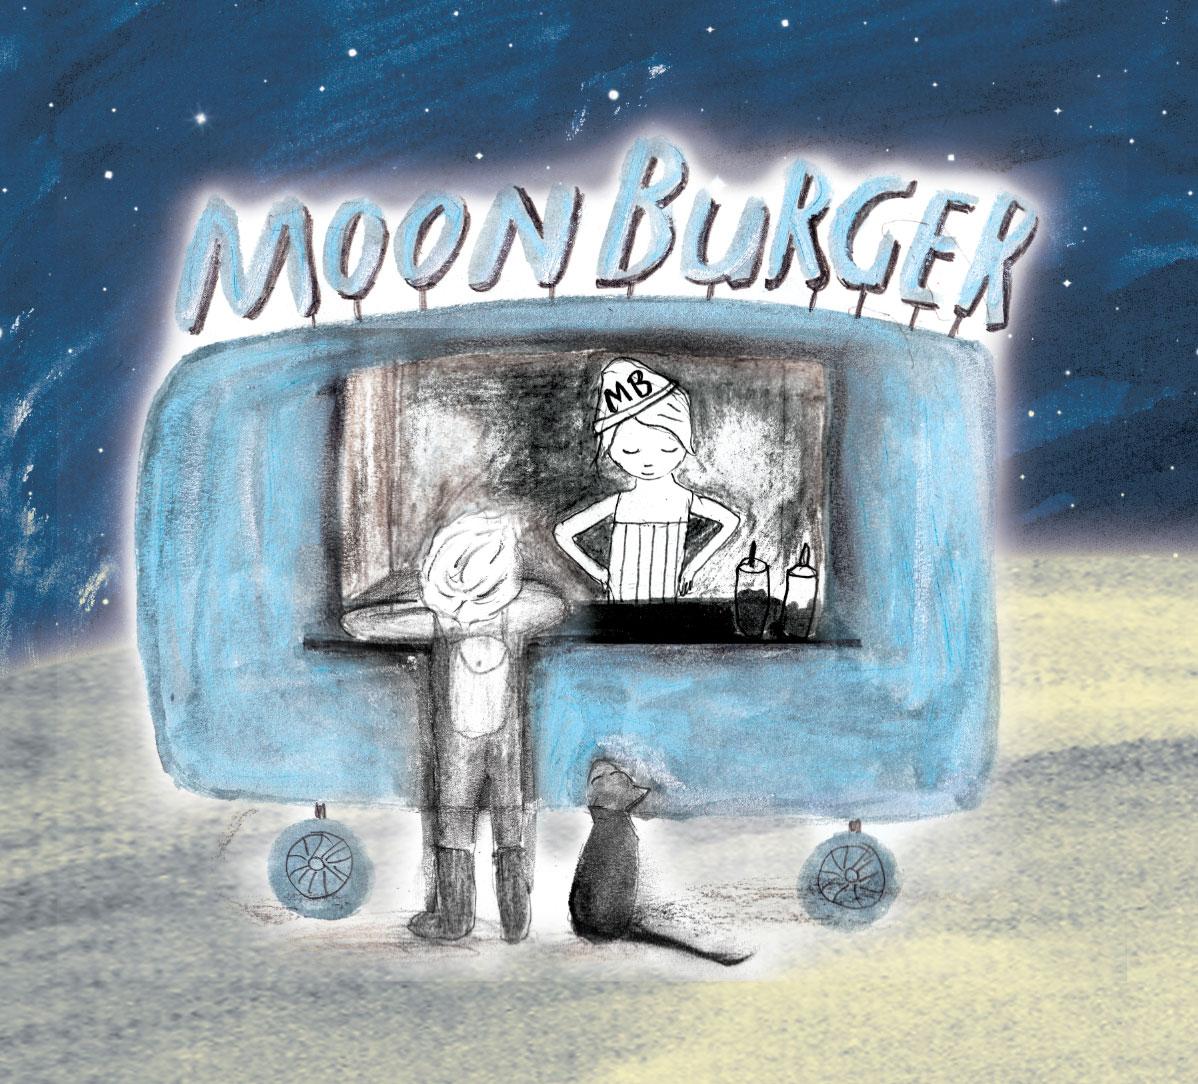 moonburger.jpg